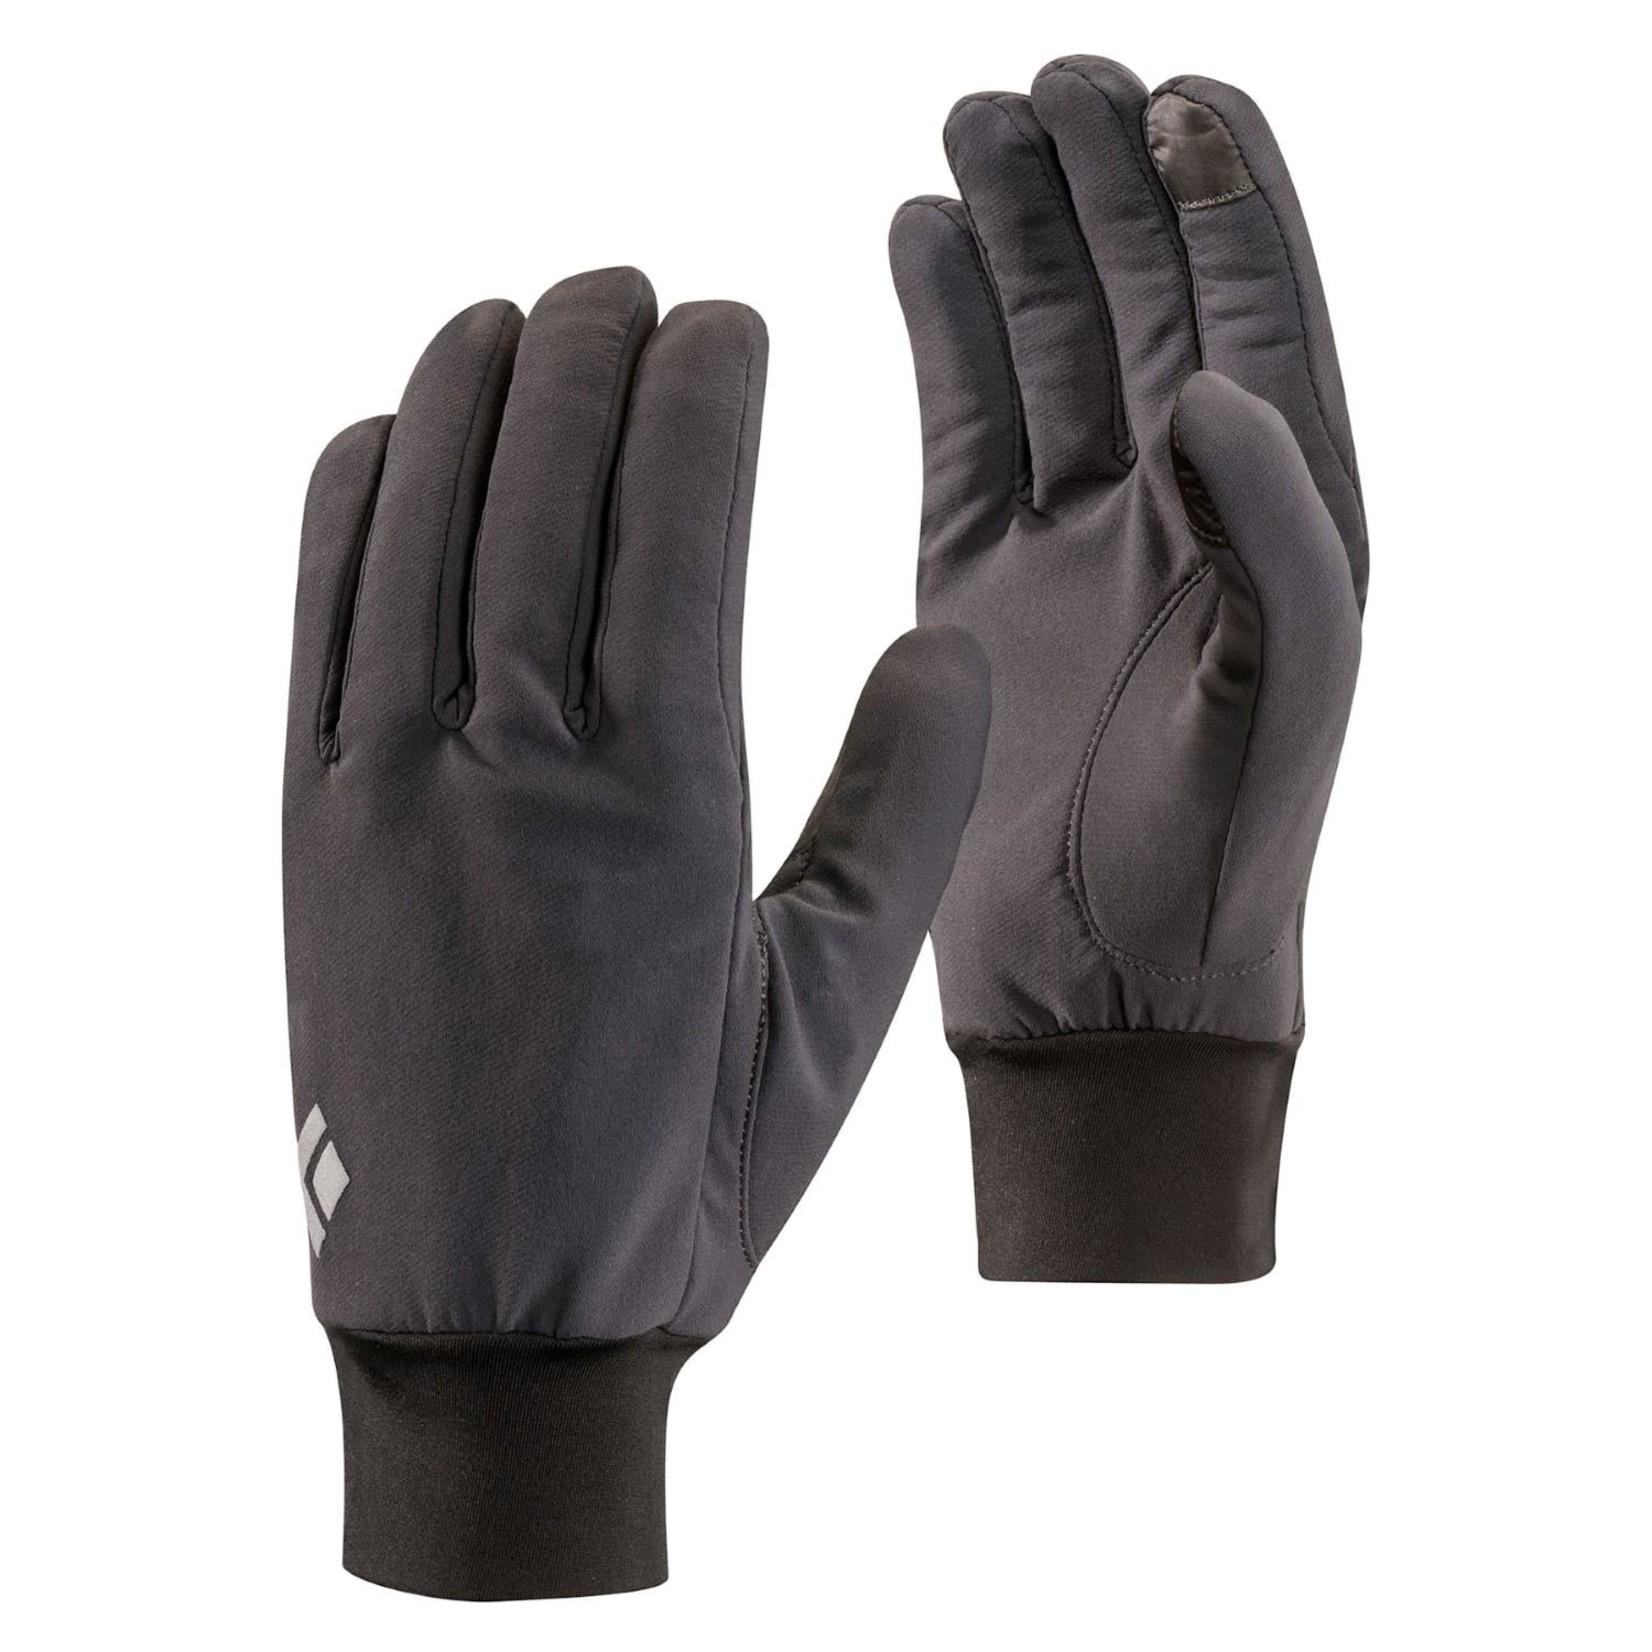 Black Diamond Black Diamond Lightweight Softshell Gloves - Unisex